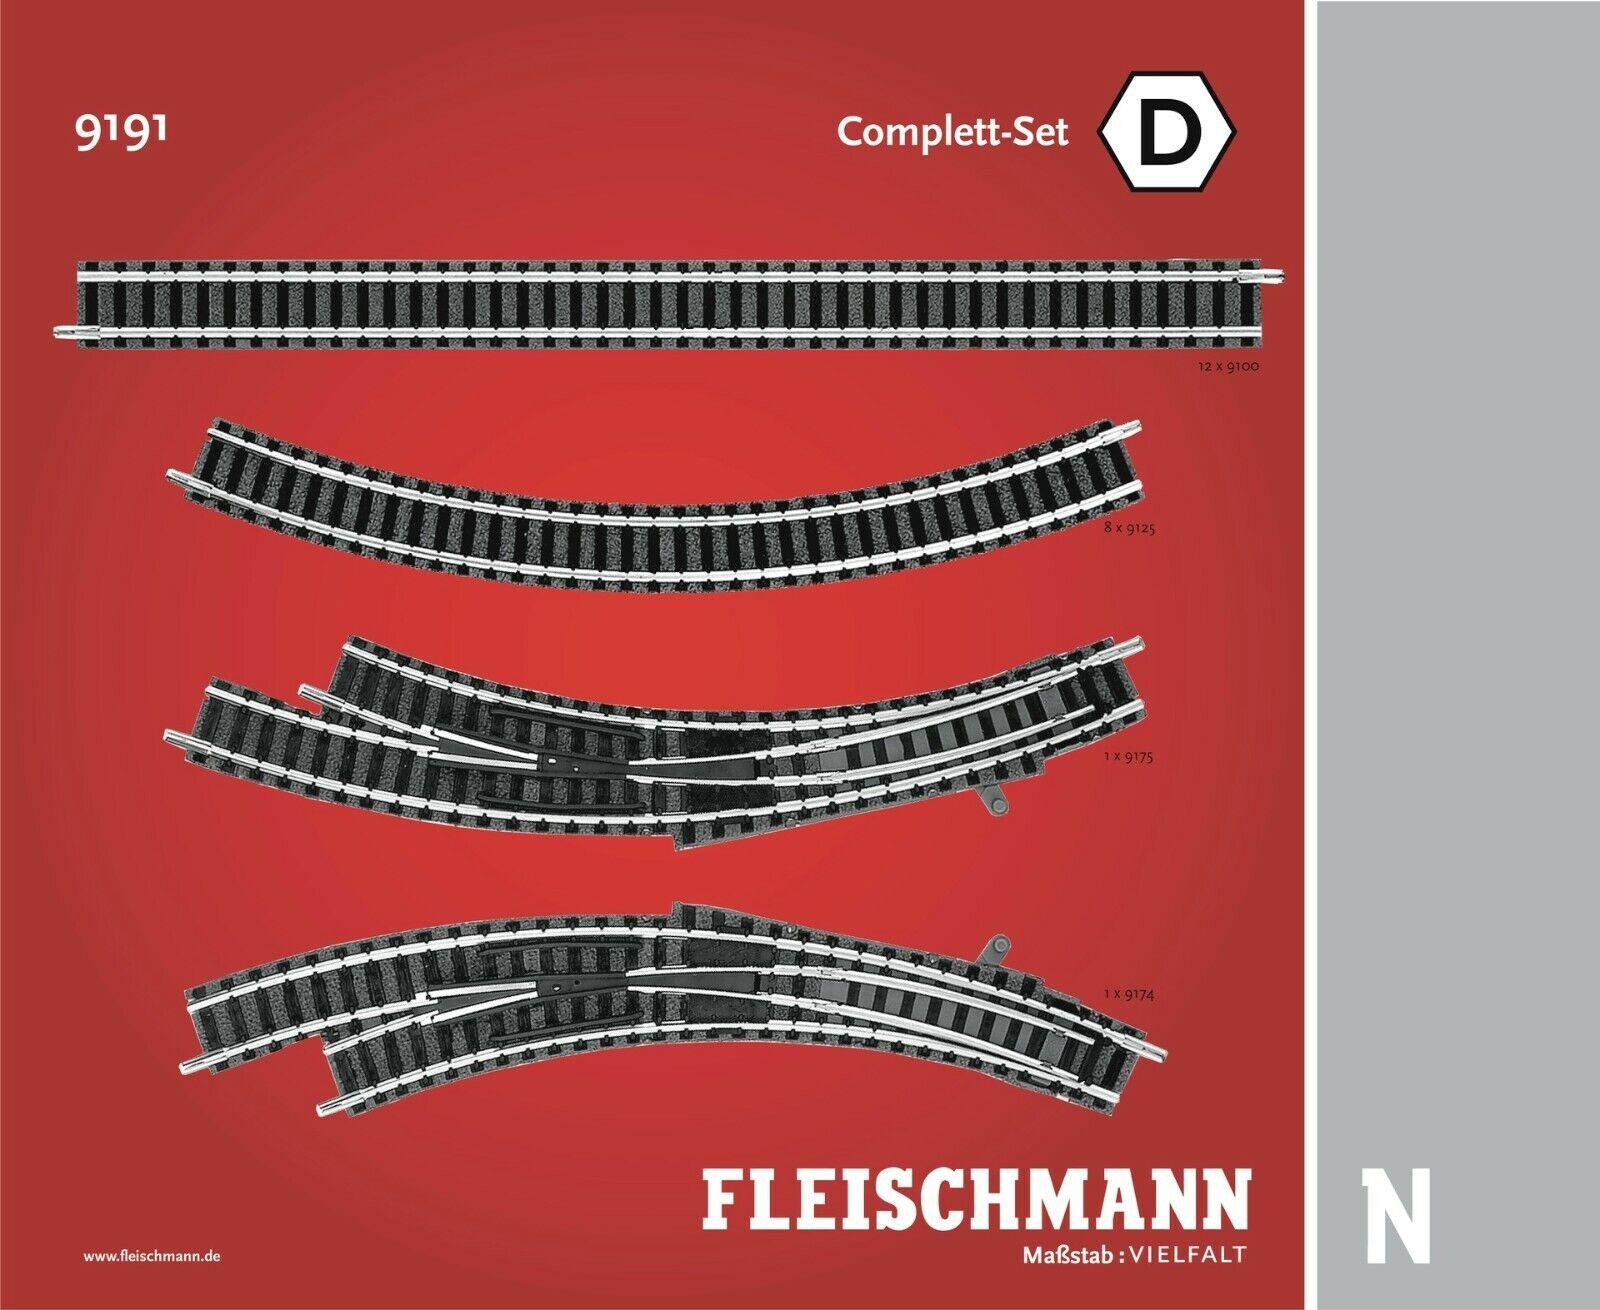 FLEISCHuomoN scala N Profi TRACK PACK. SERIE COMPLETA D